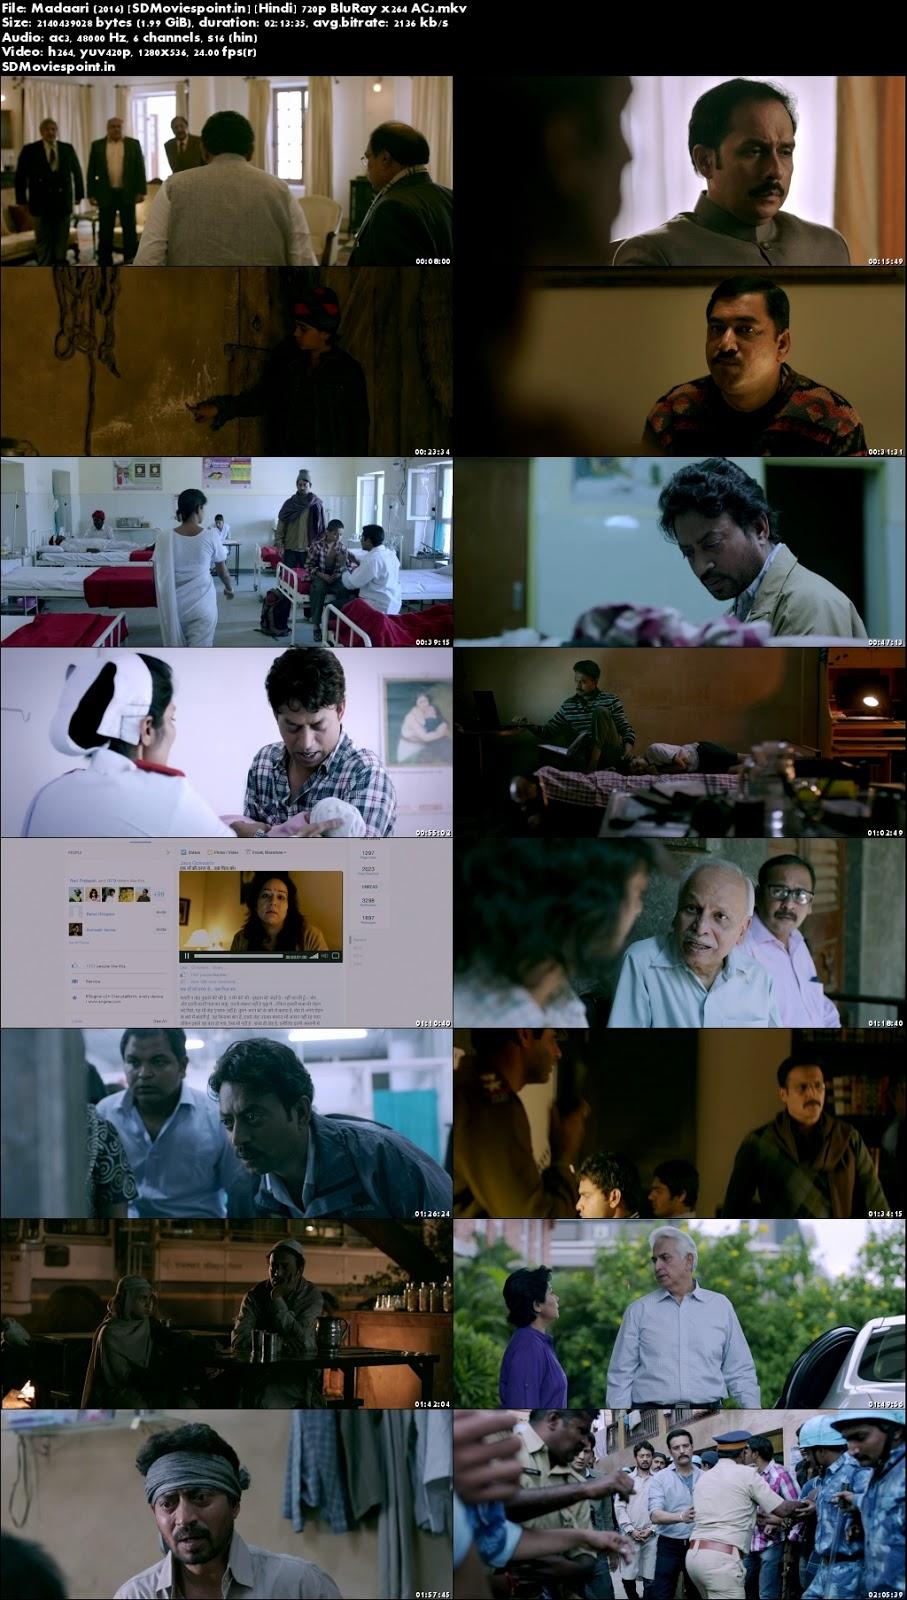 Screen Shots Madaari (2016) Full HD Movie Dwownload 720p